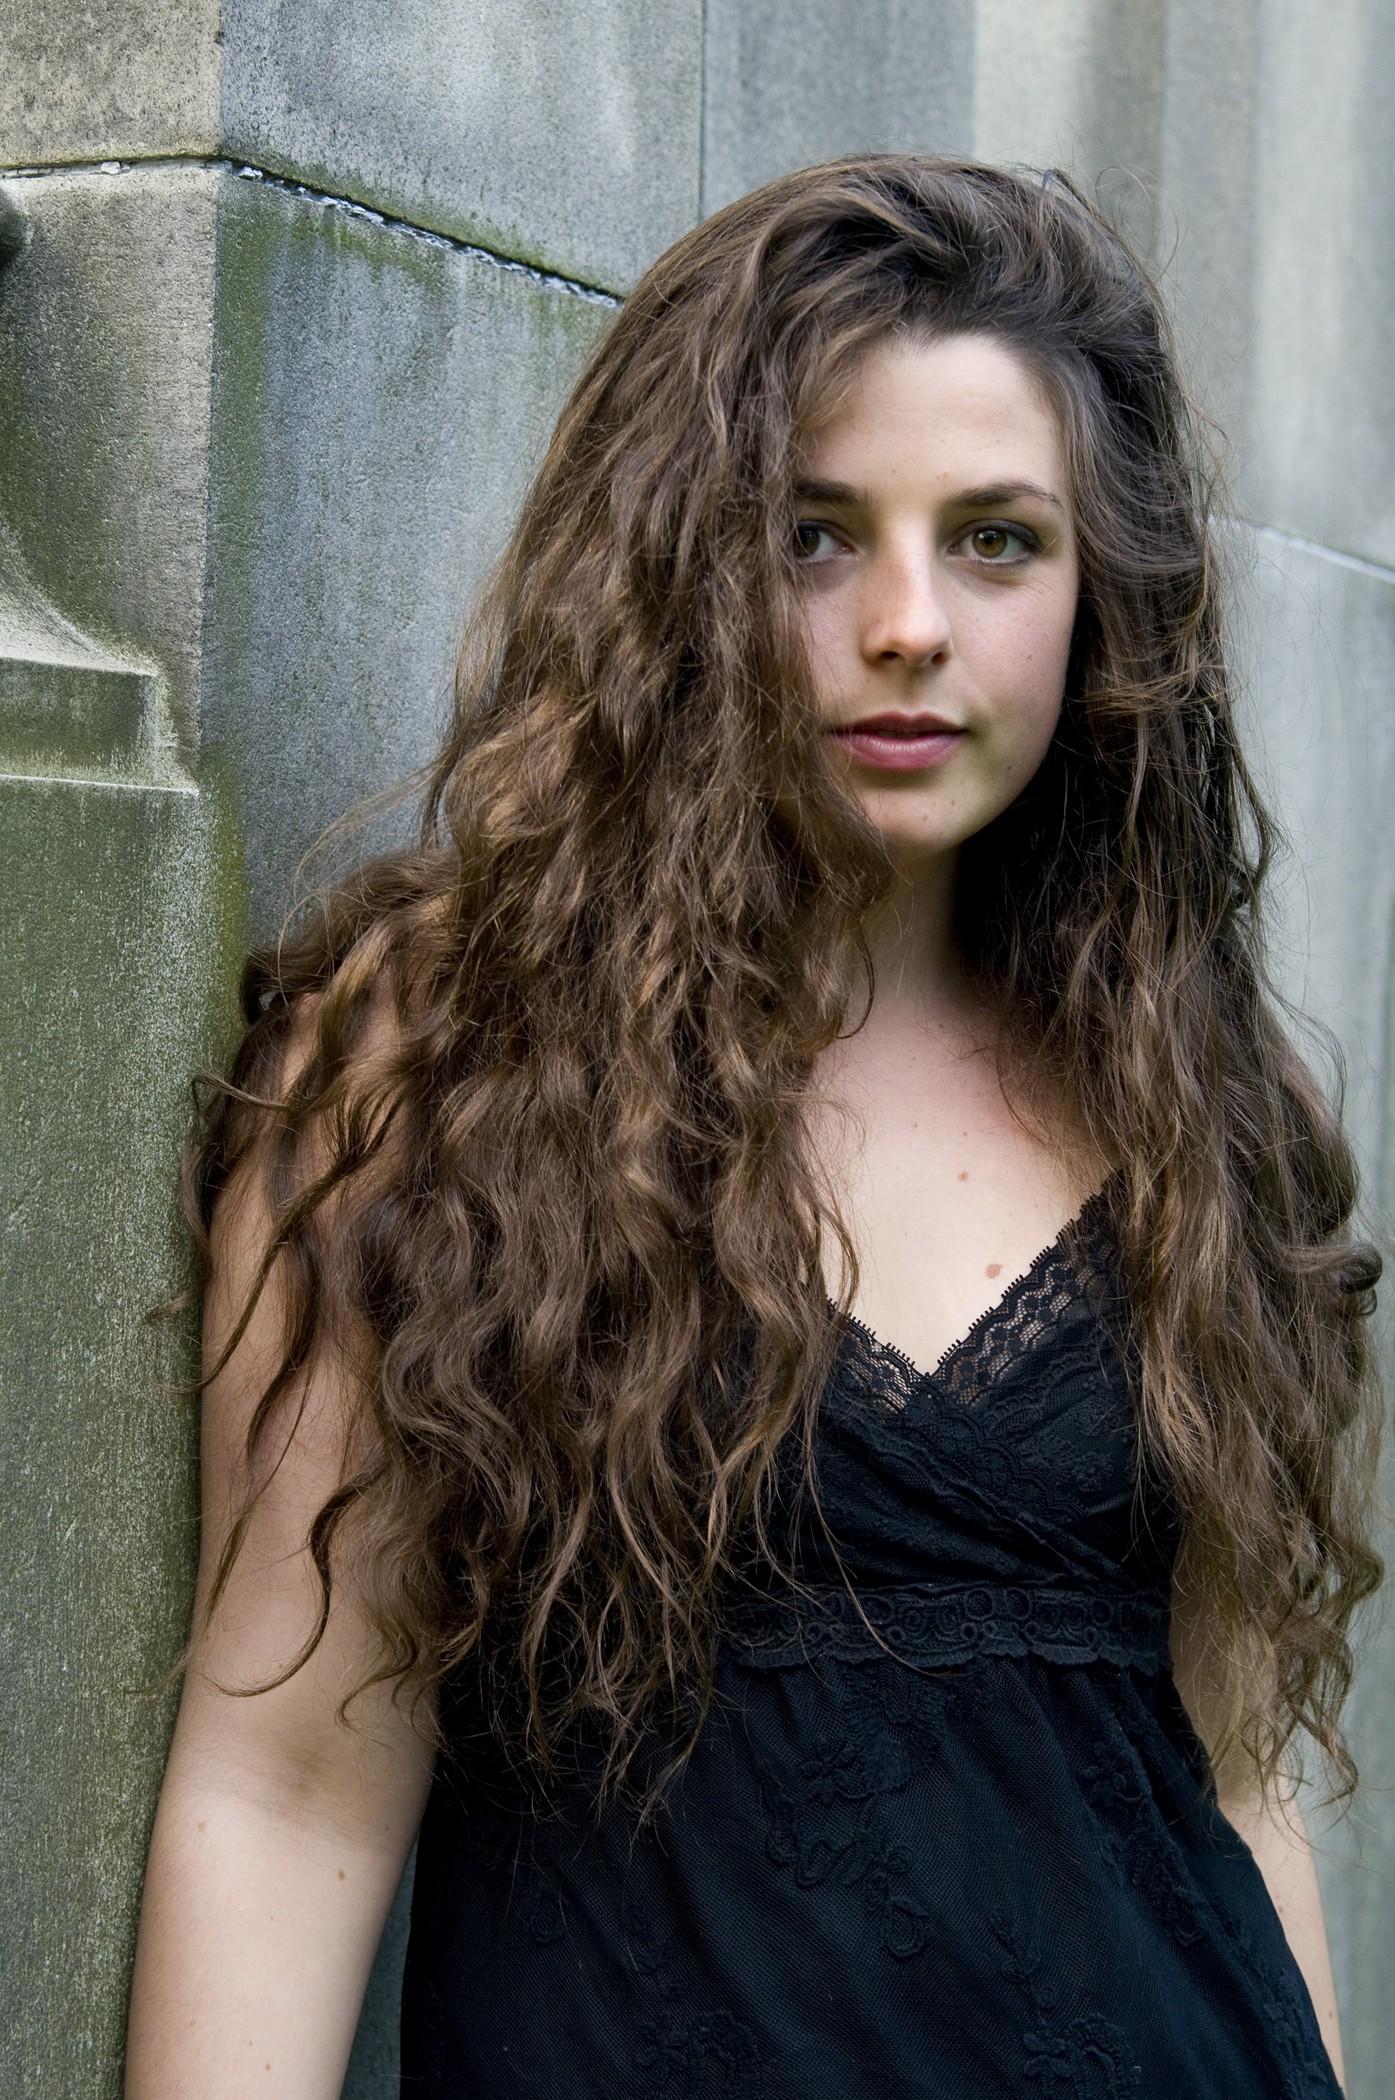 Charlotte Corbeil-Coleman